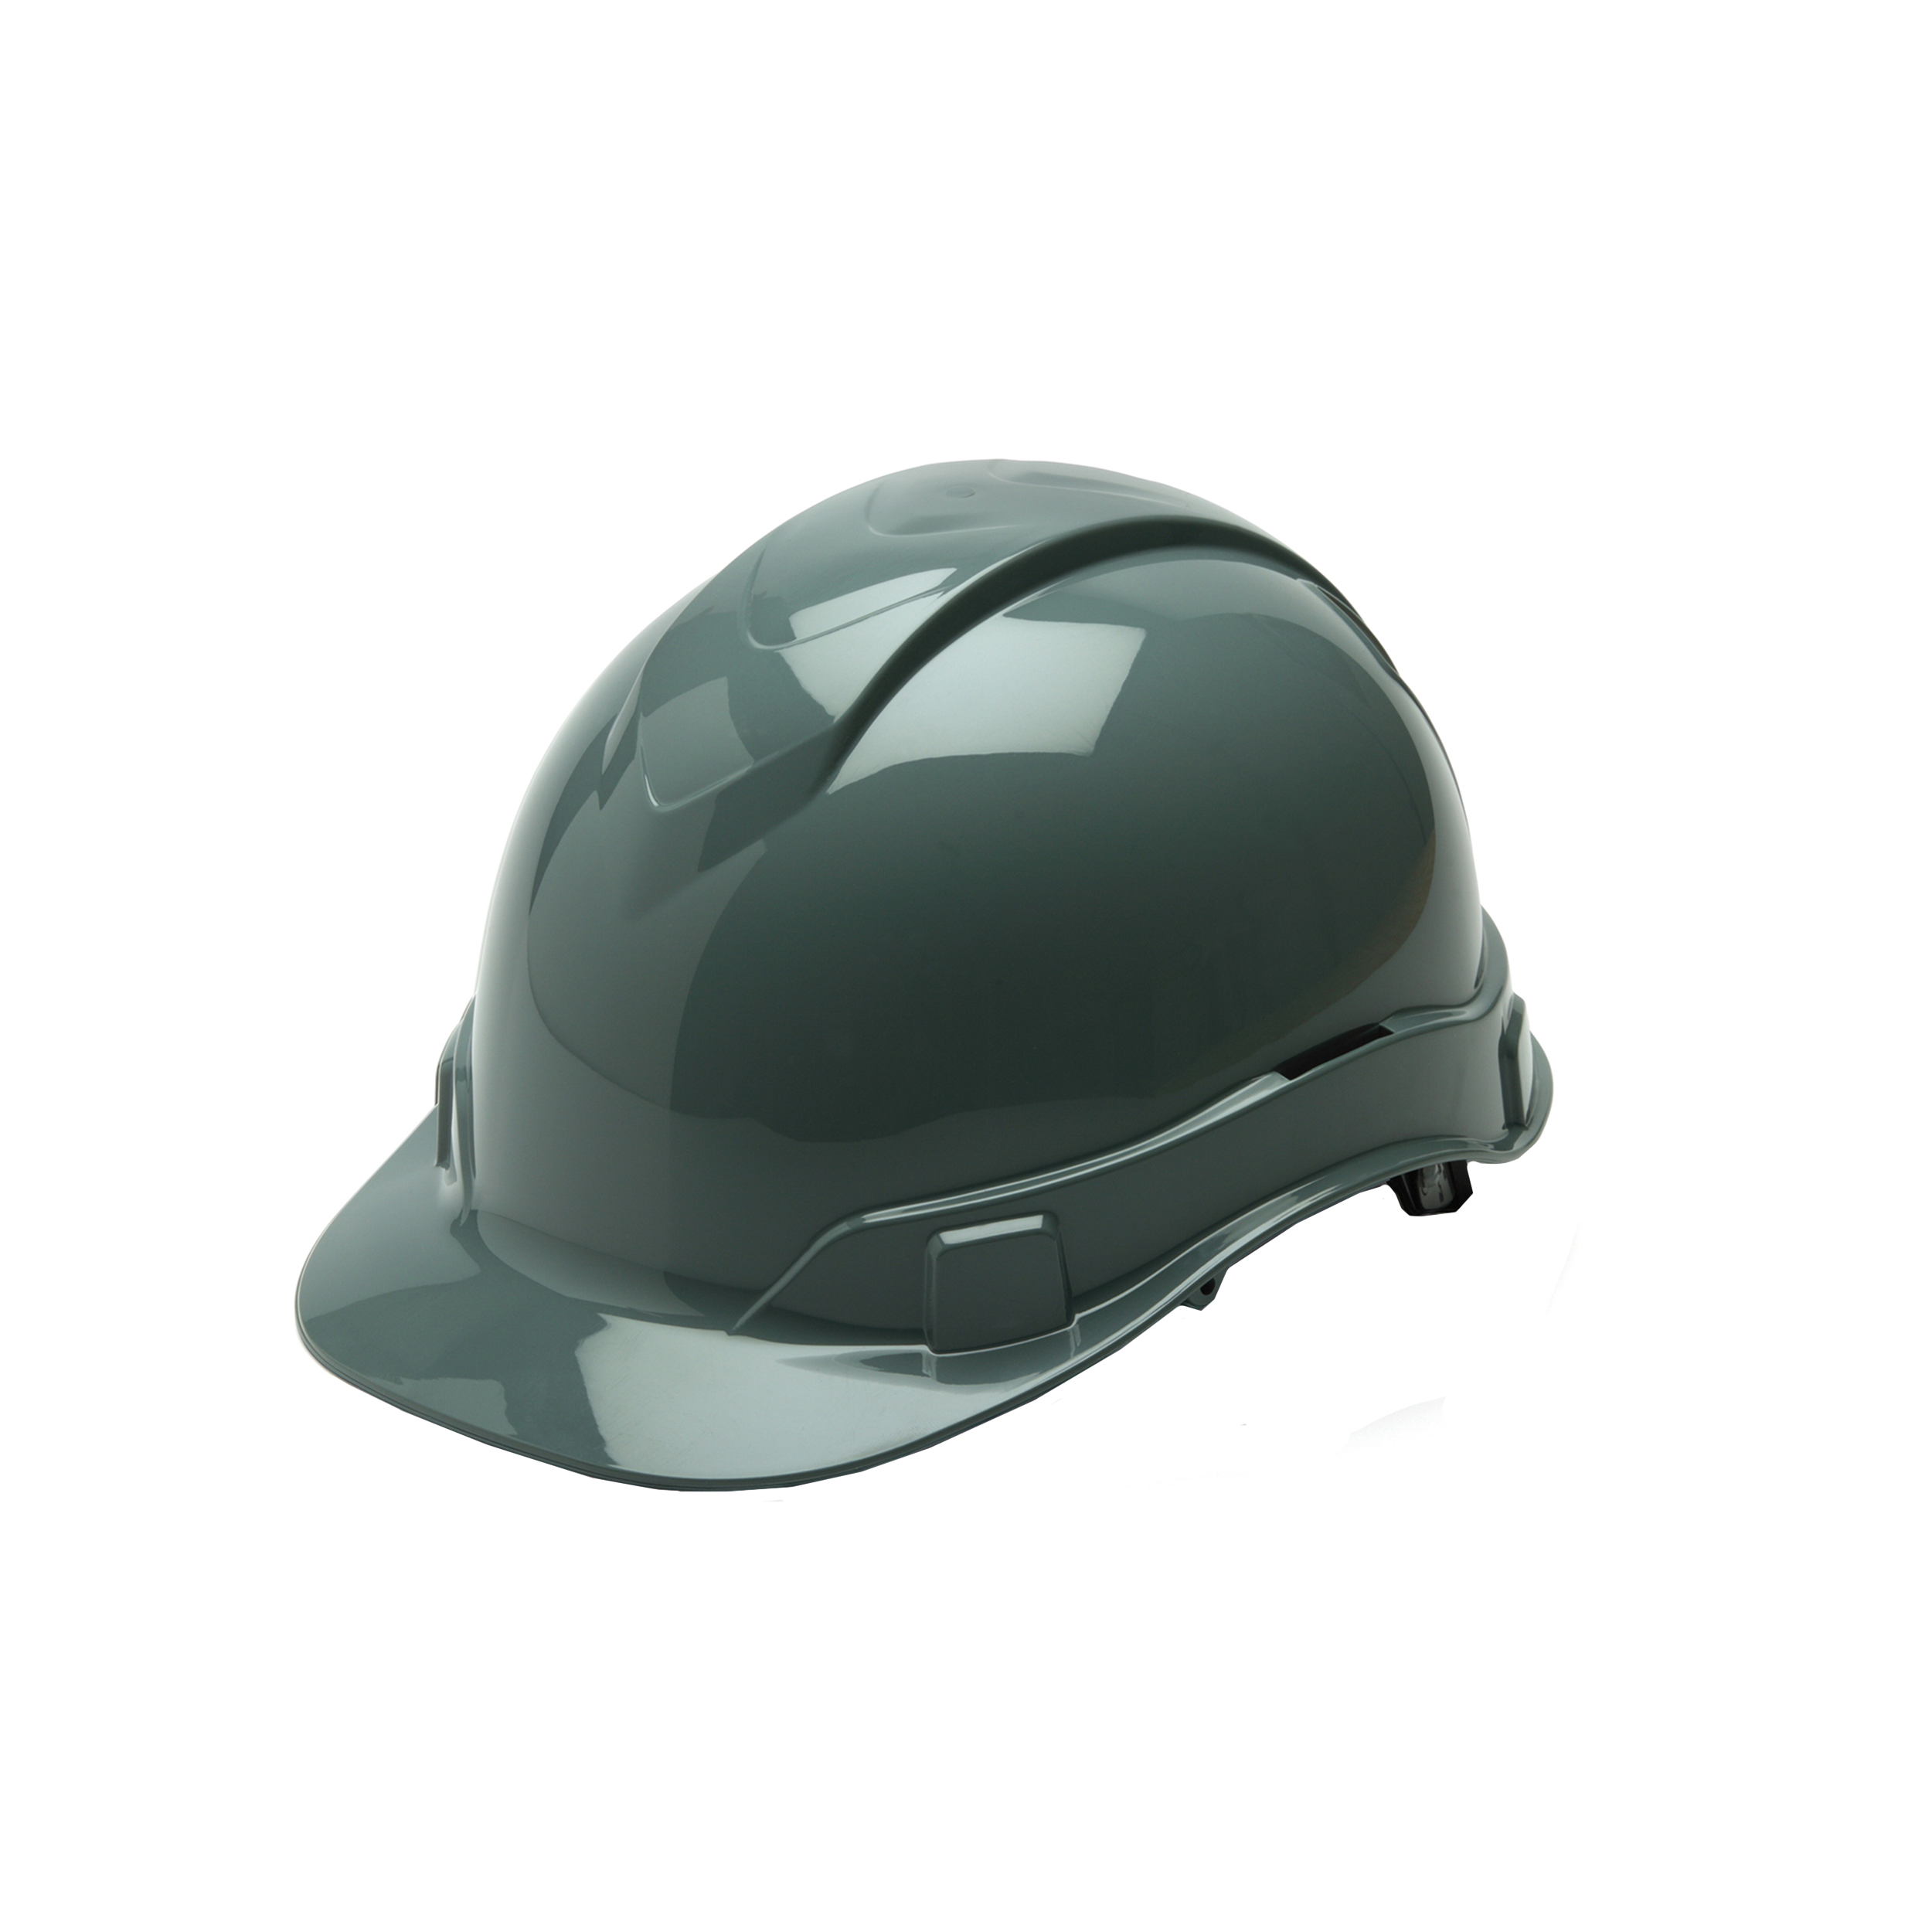 Pyramex Safety Products Ridgeline Cap Style Hard Hat